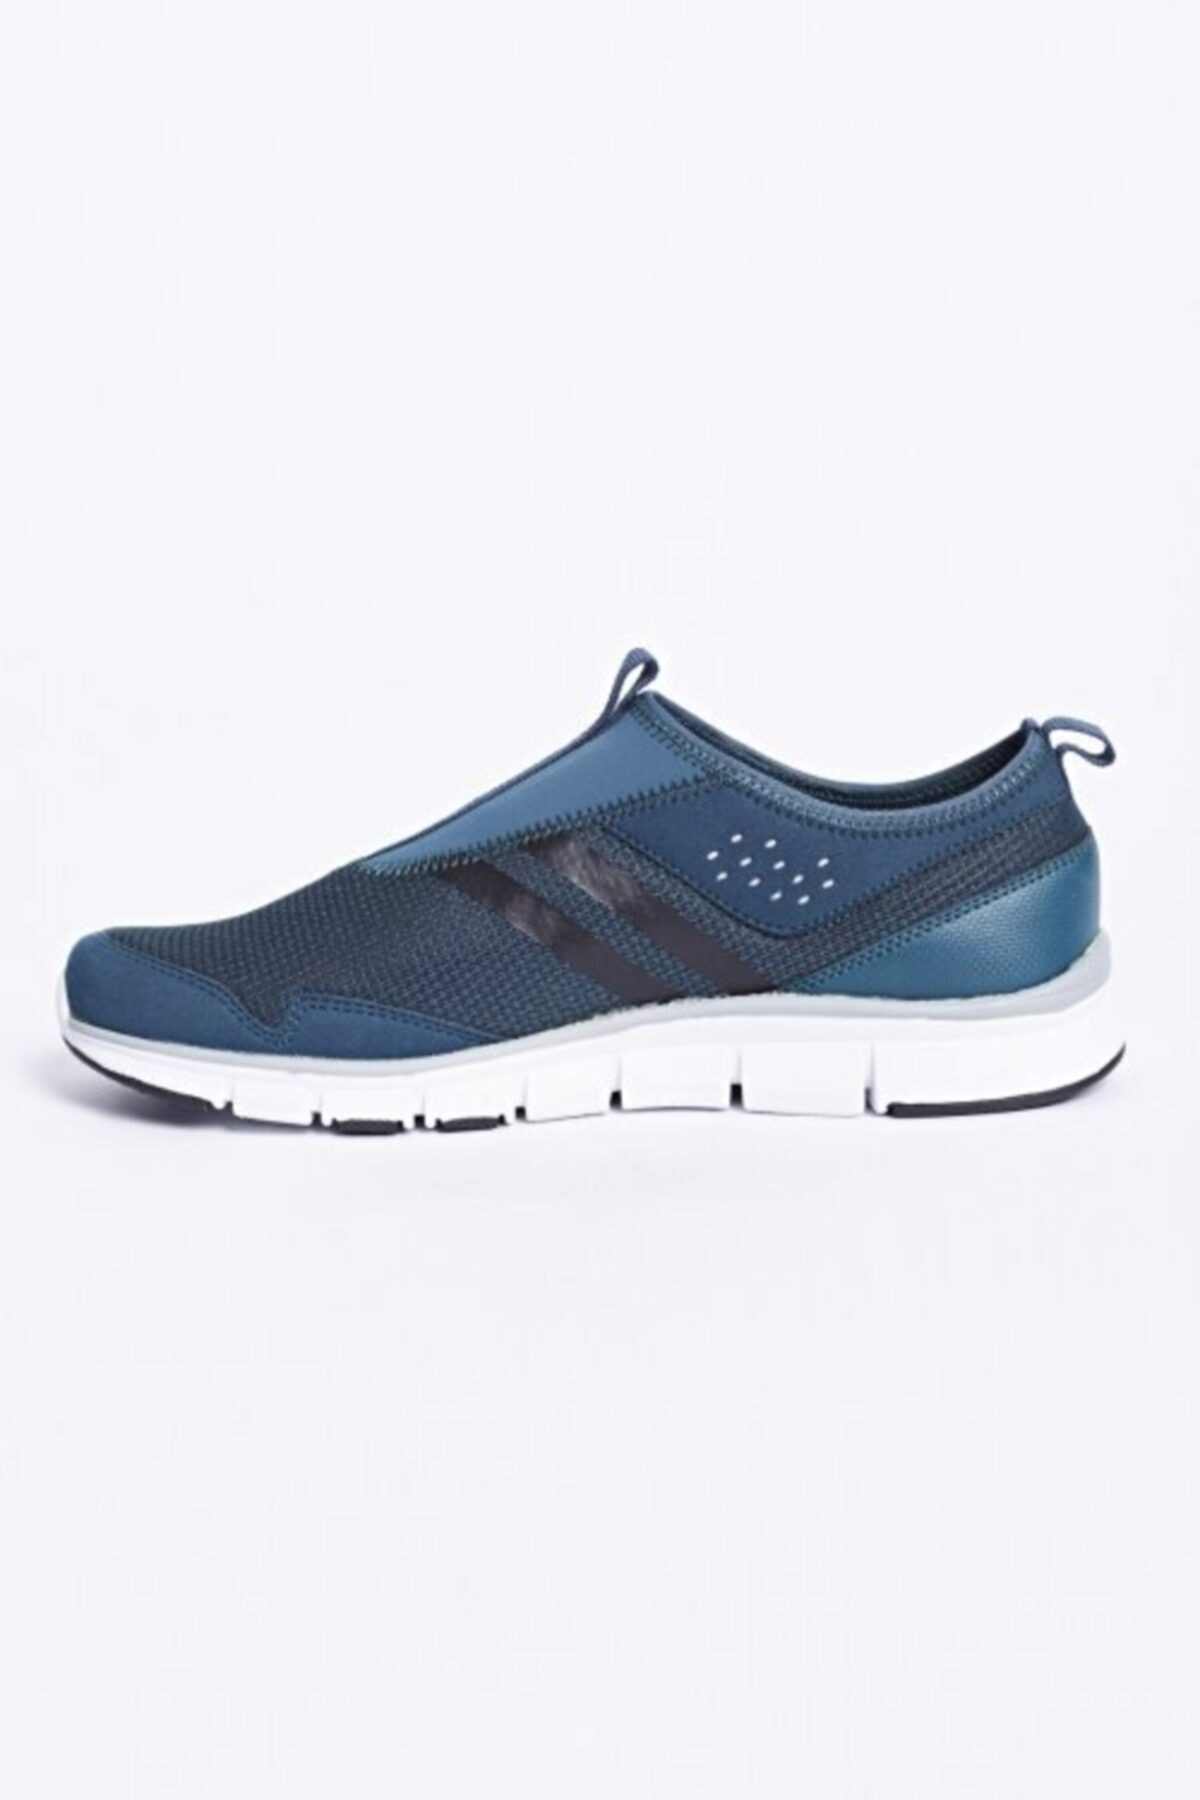 Lescon Unısex Sneaker Aqua Ayakkabı L-4591 2